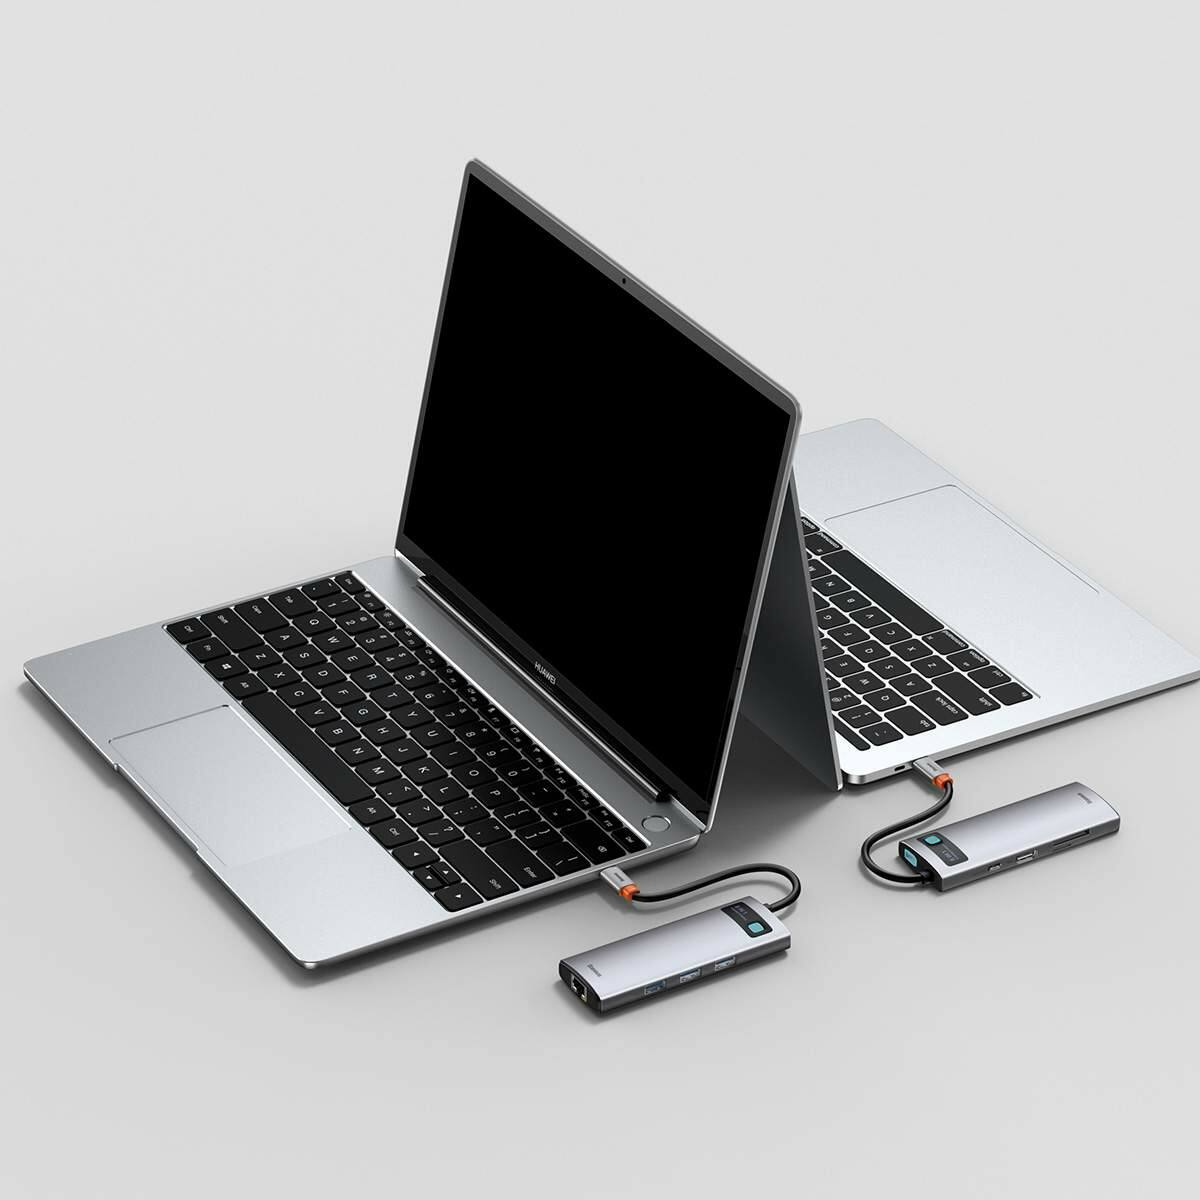 Baseus HUB Metal Gleam Series 8-in-1 Multifunkciós (Type-C bemenetről PD/4K HD/USB3.0) Dokkoló, szürke (CAHUB-CV0G)